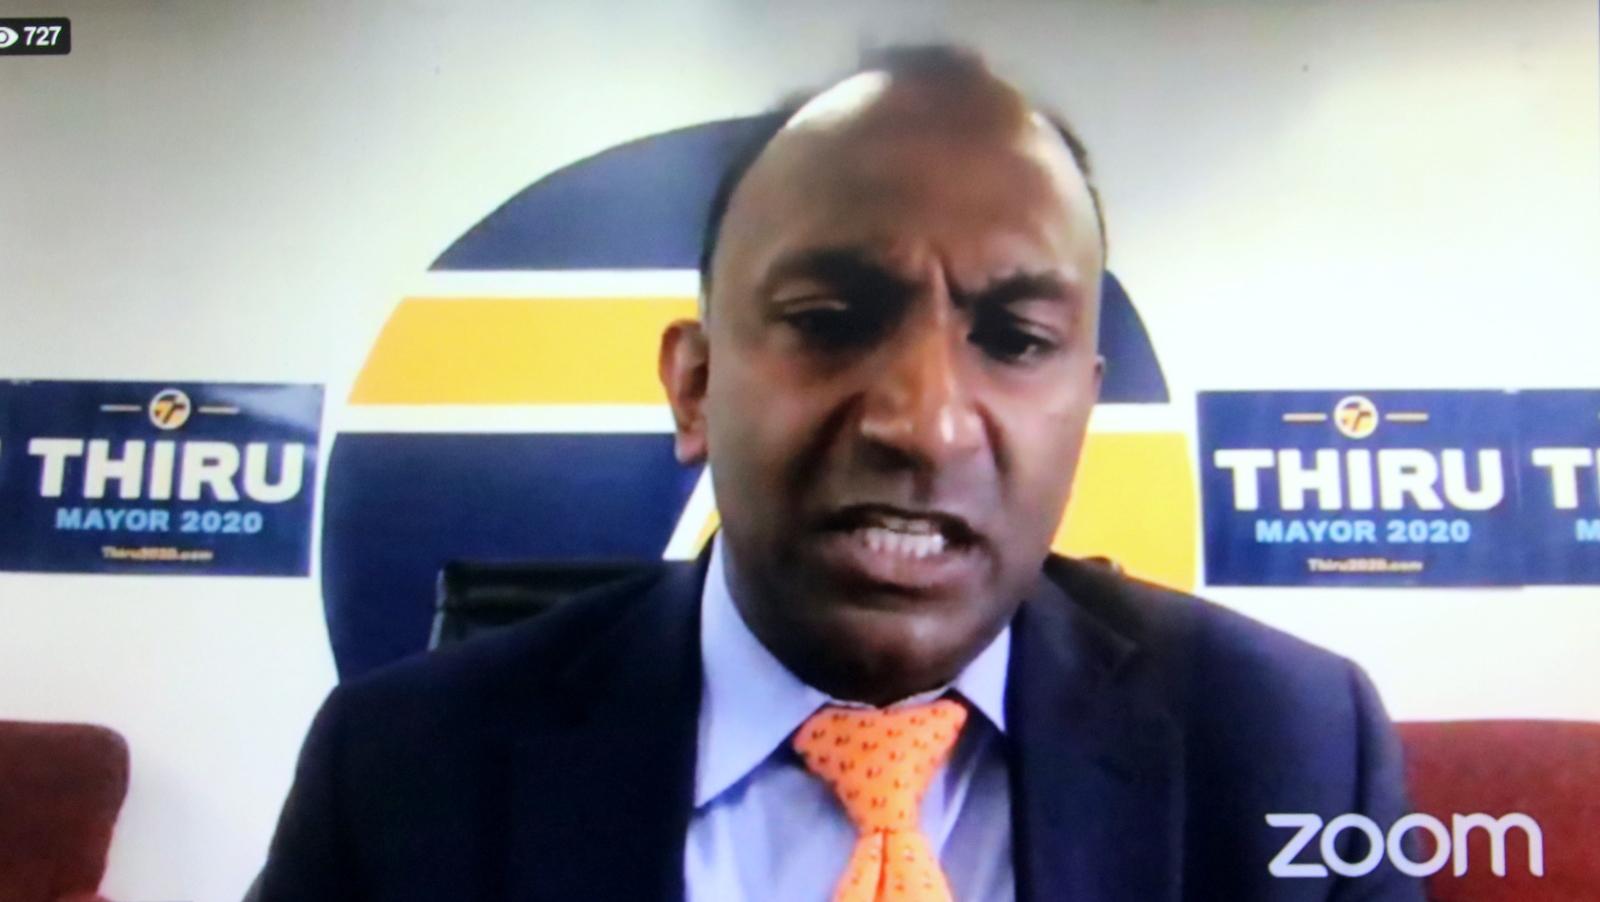 Baltimore mayoral candidate Thiru Vignarajah. (Baltimore NAACP Facebook)